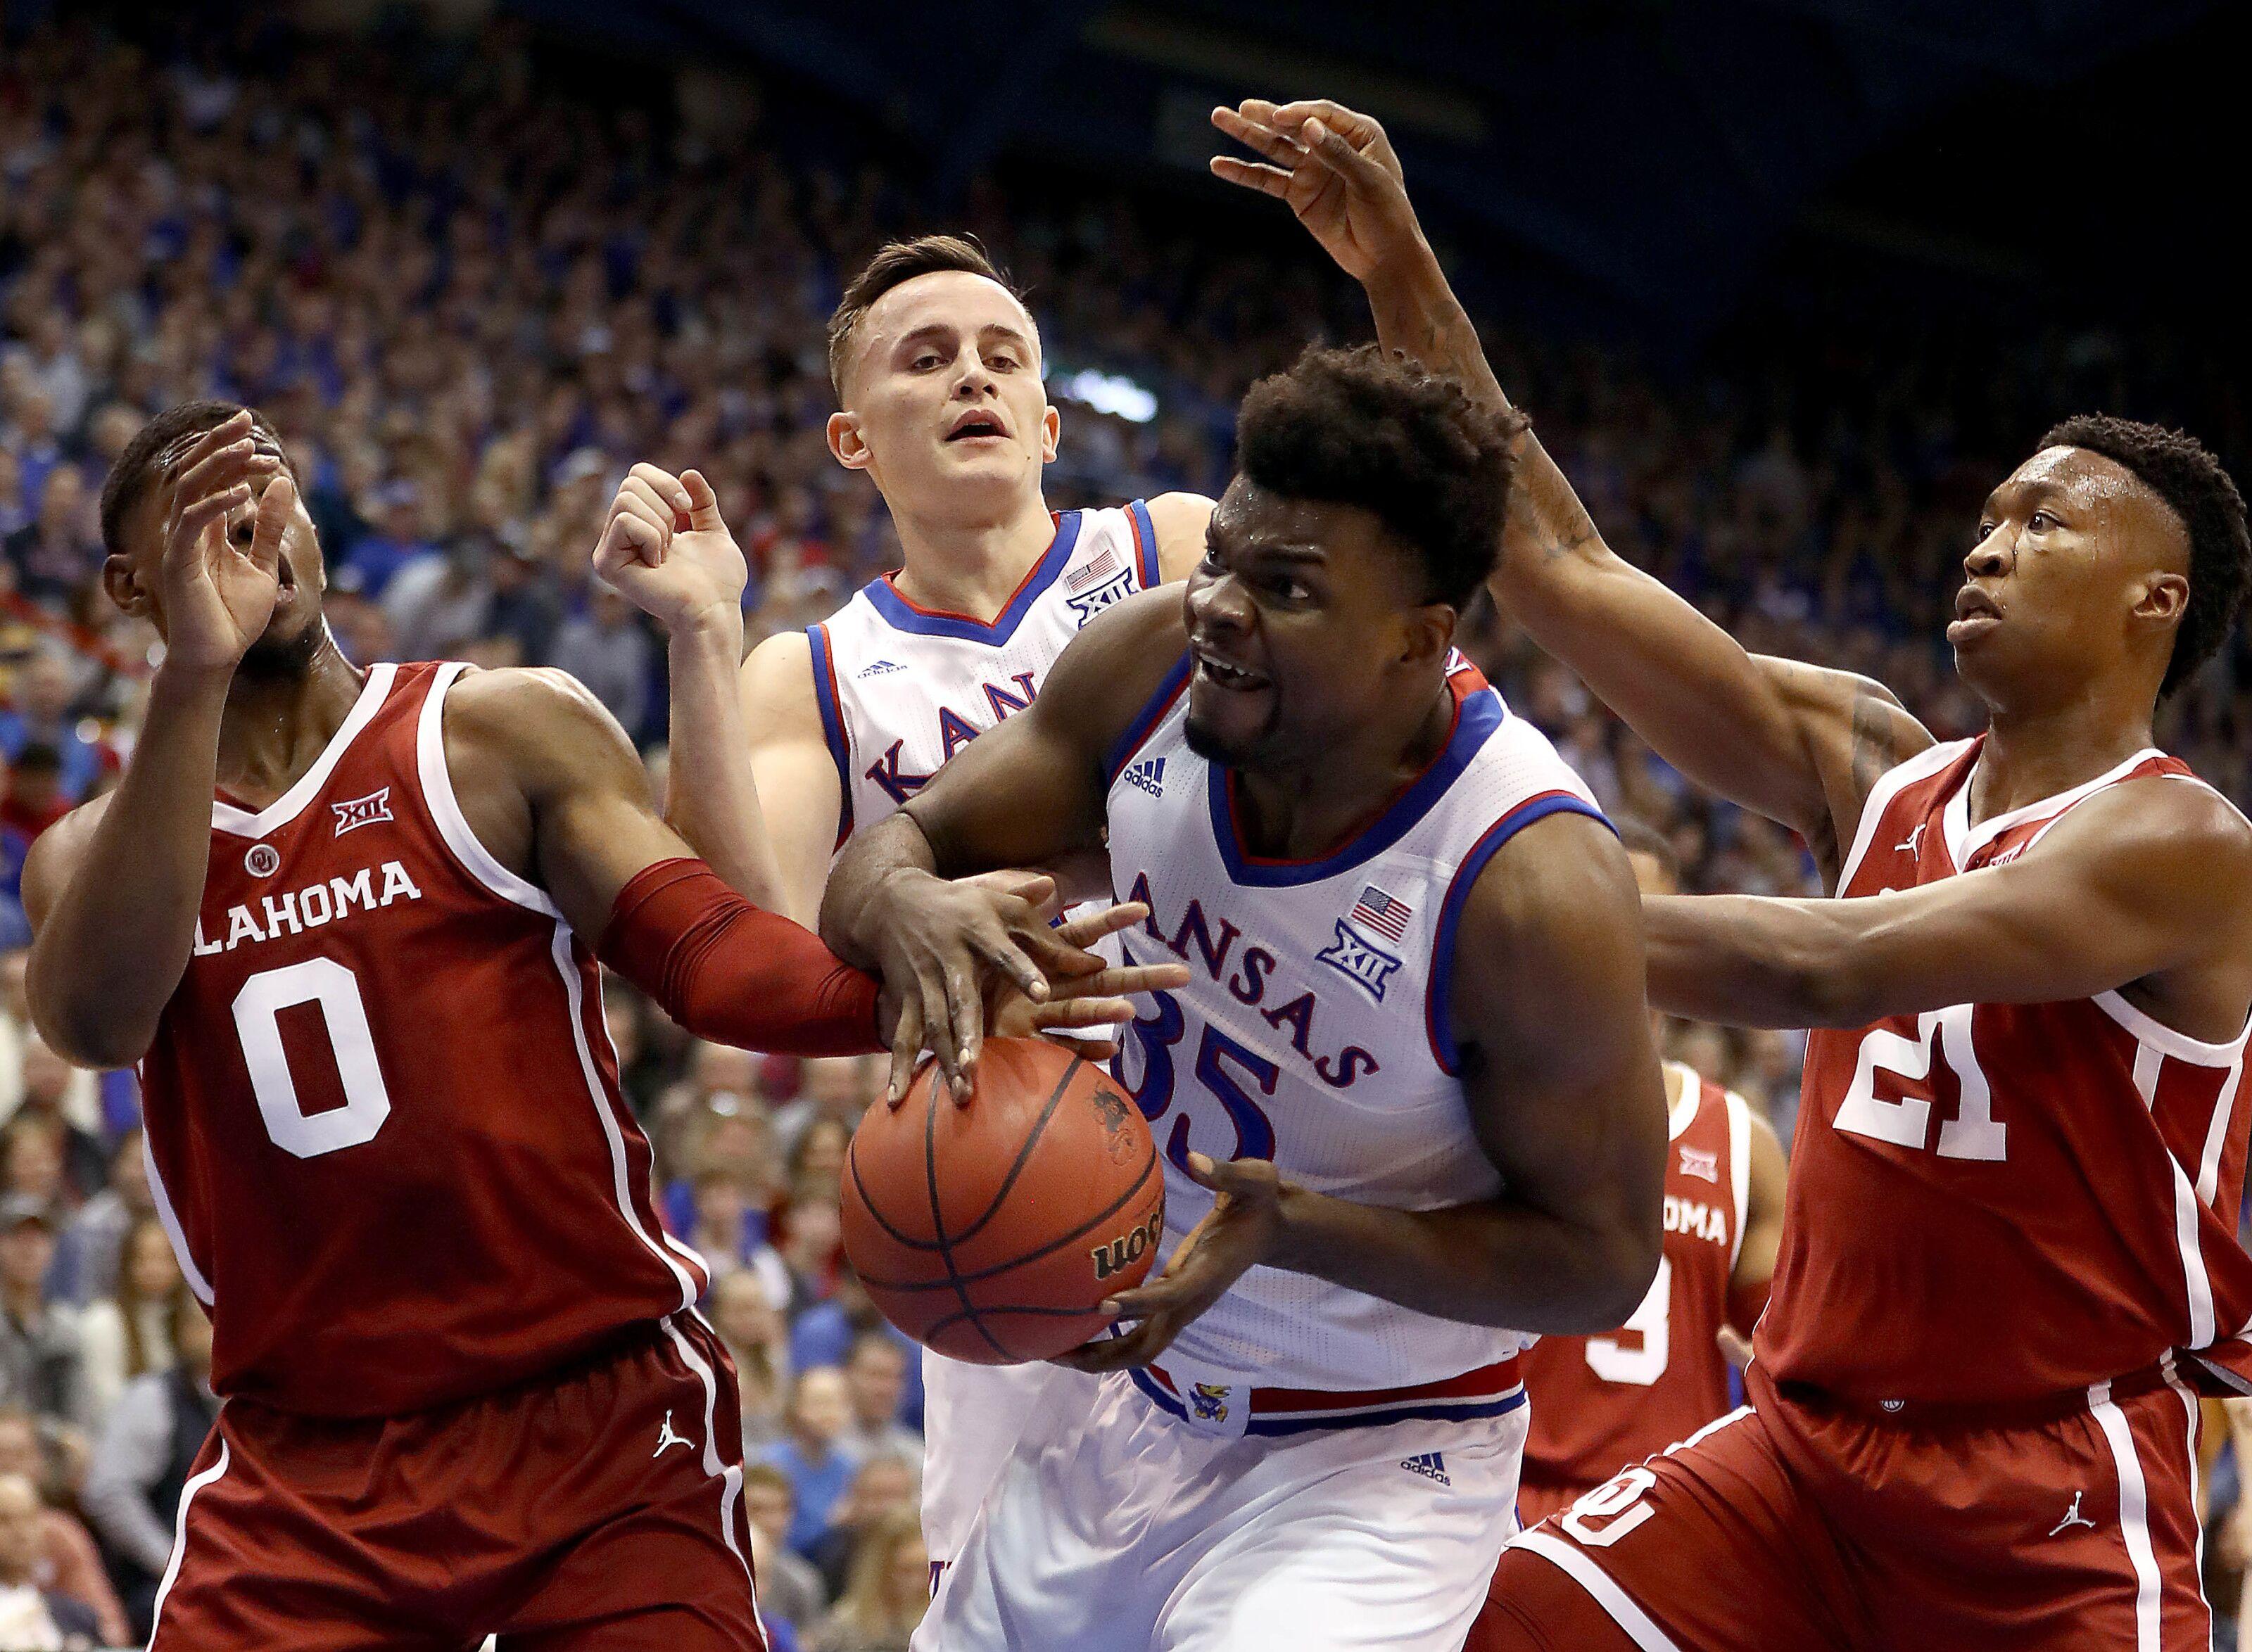 Kansas Basketball: Jayhawks at peak of 2019-20 Big 12 preseason coaches' poll